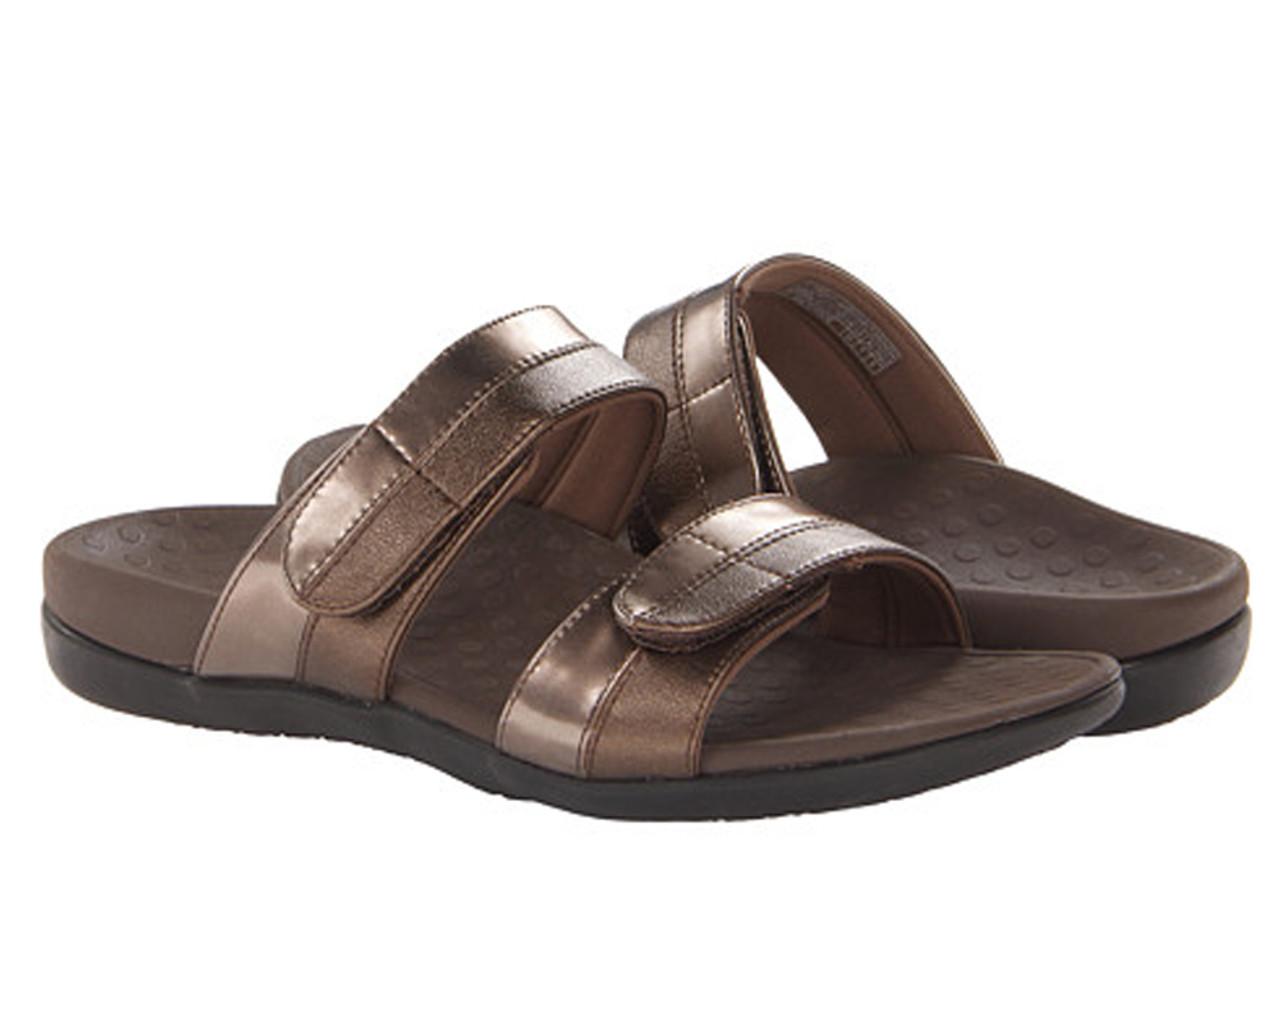 96f4ce5ae776 Vionic Women s Shore Slide Sandal Bronze - Shop now   Shoolu.com